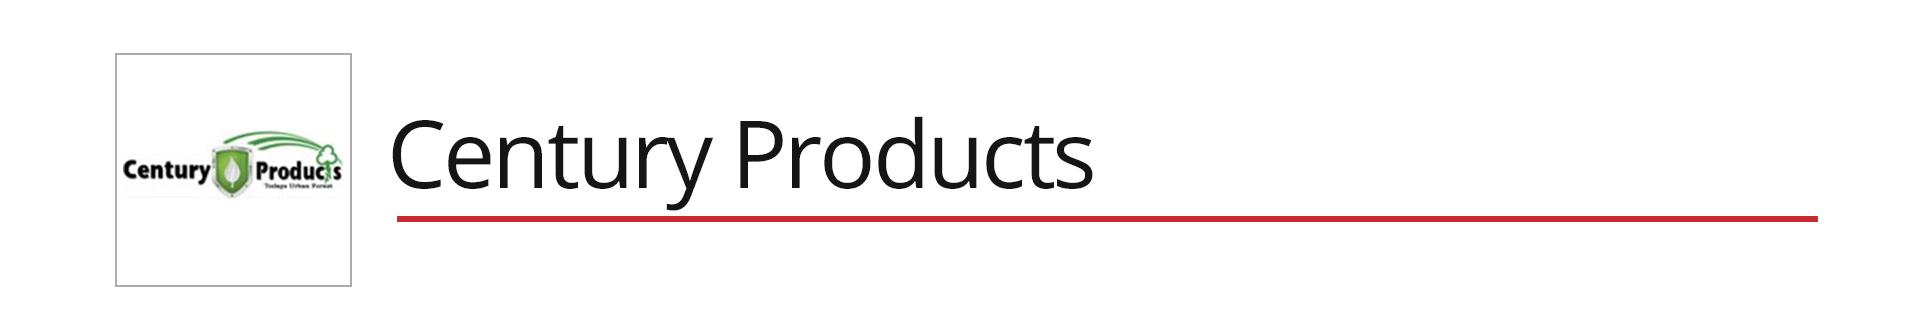 Century-Products_CADBlock-Header.jpg